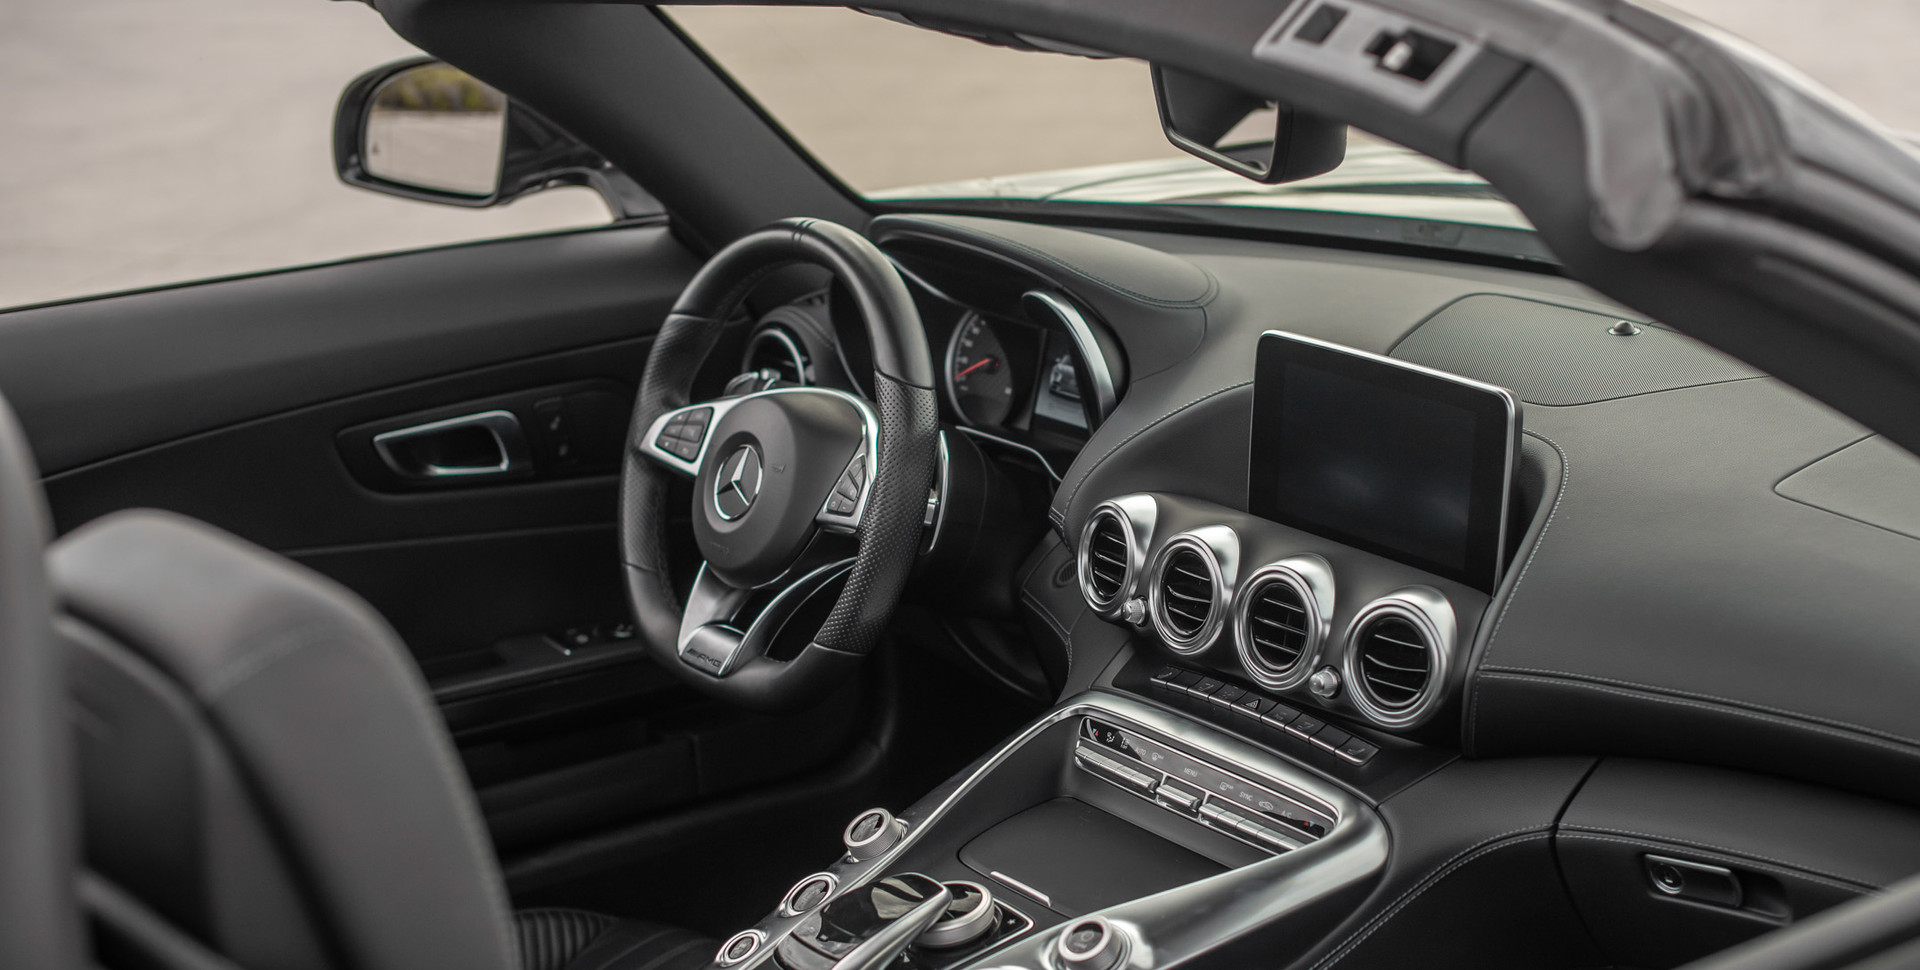 MB AMG GT Cabrio-25.jpg.JPG